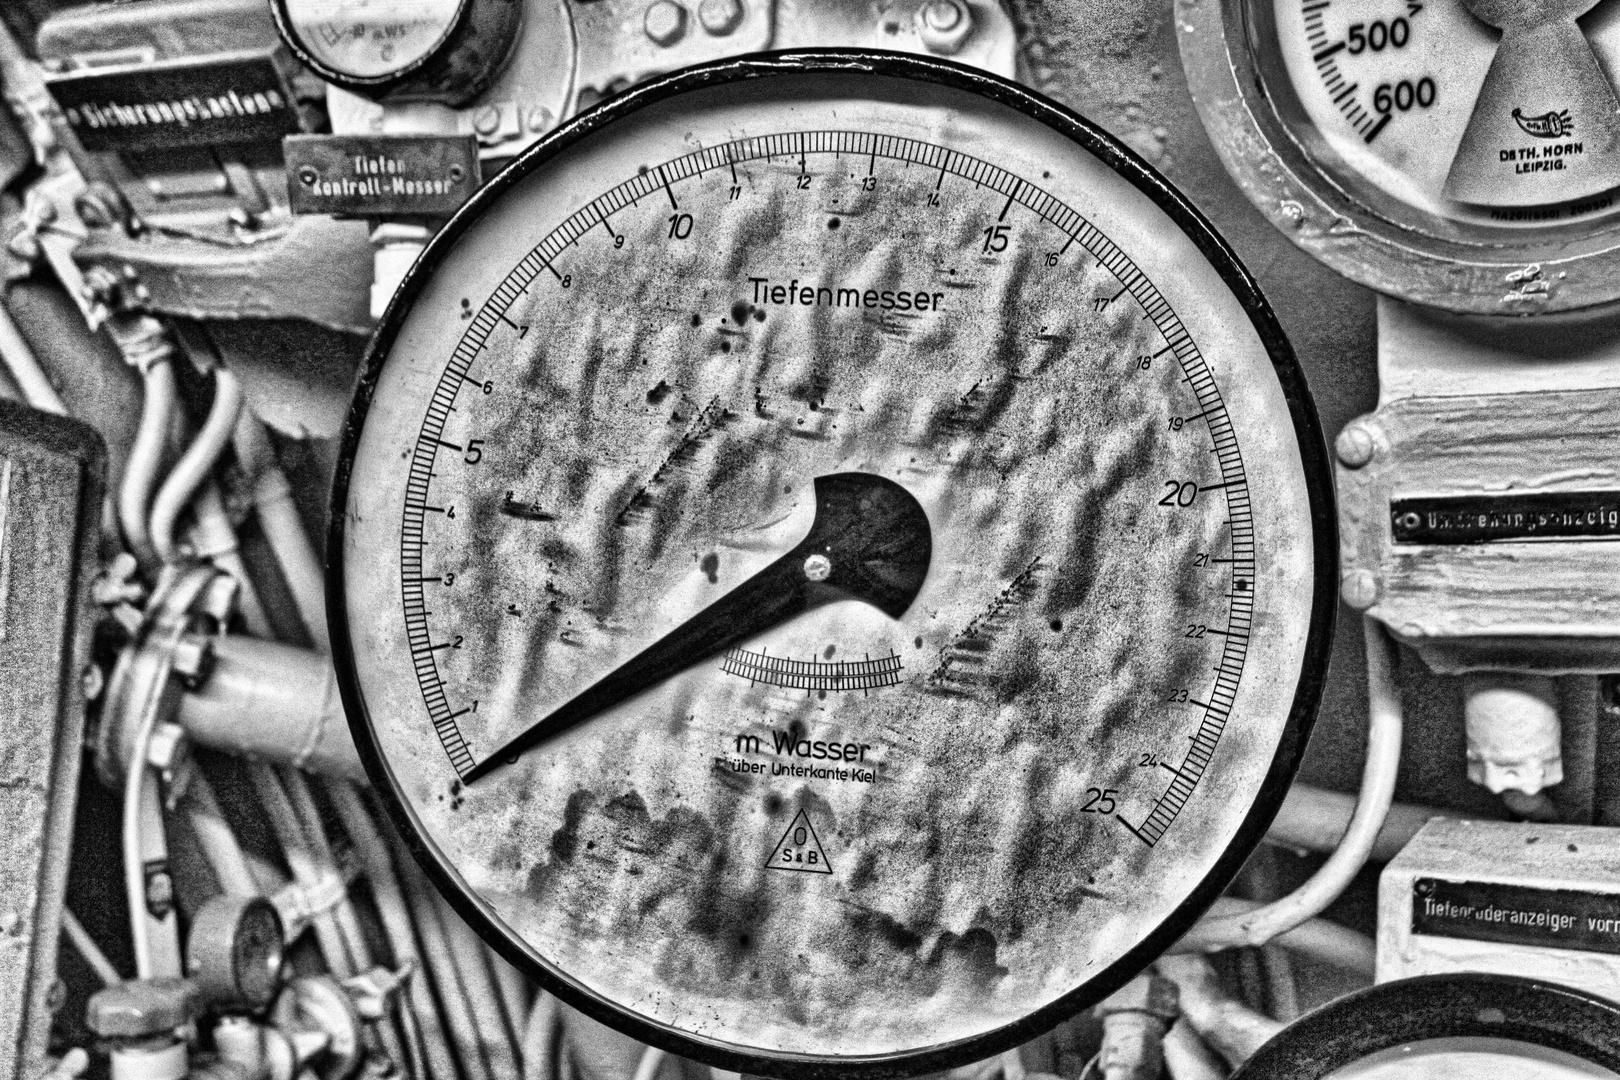 Das verlorene U-Boot - Tiefenmesser